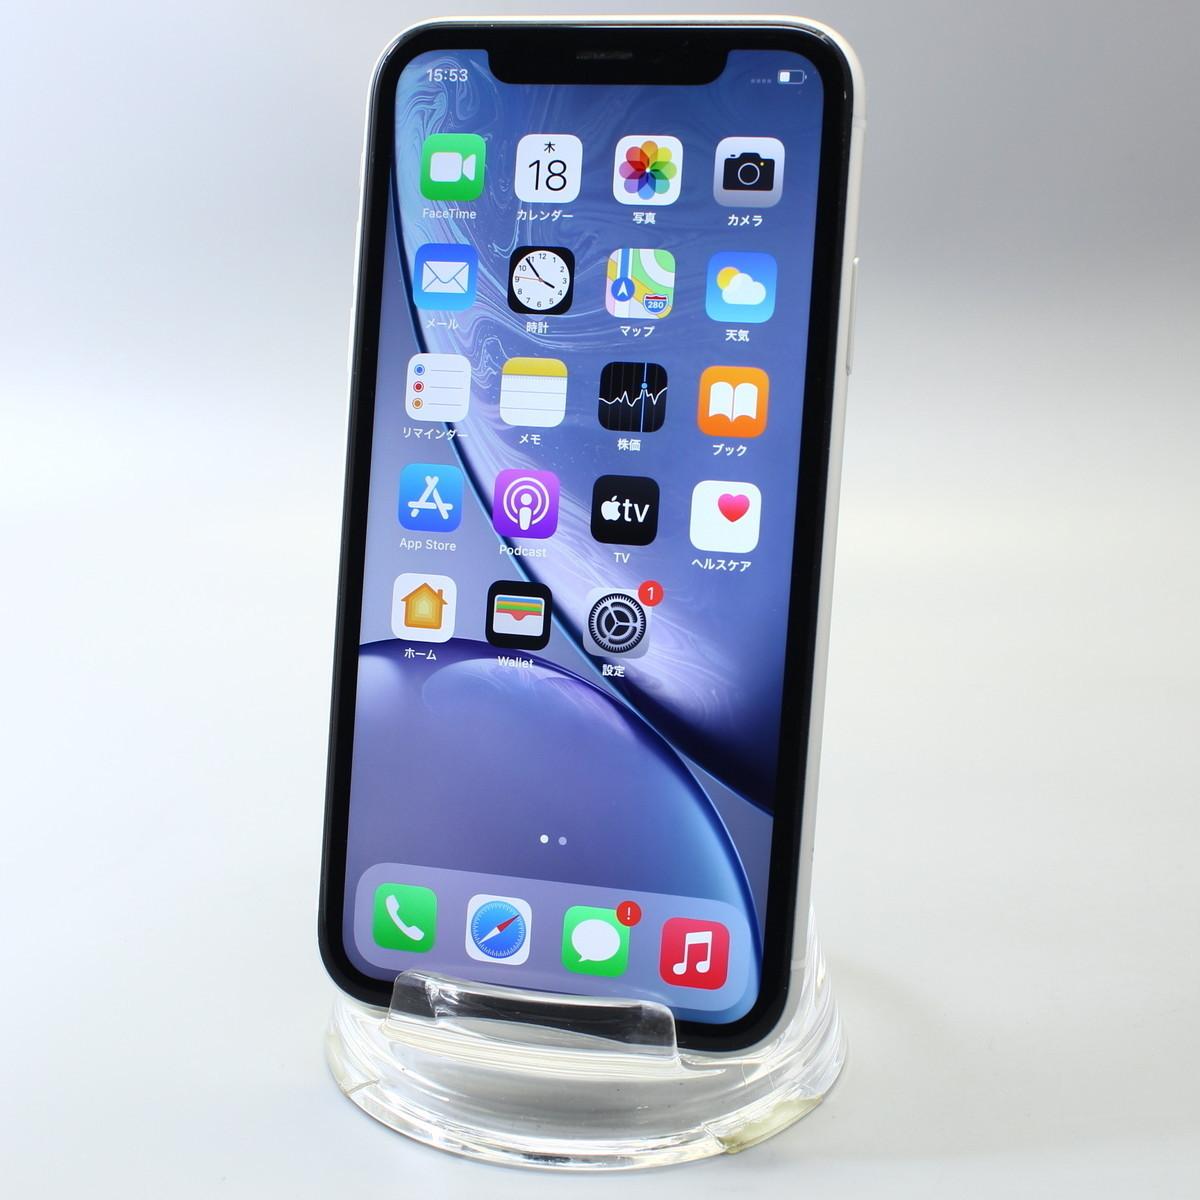 Apple iPhoneXR 128GB ホワイト A2106 MT0J2J/A バッテリ89%■SIMフリー(SIMロック解除済)★Joshin(ジャンク)6785【送料無料?1円】